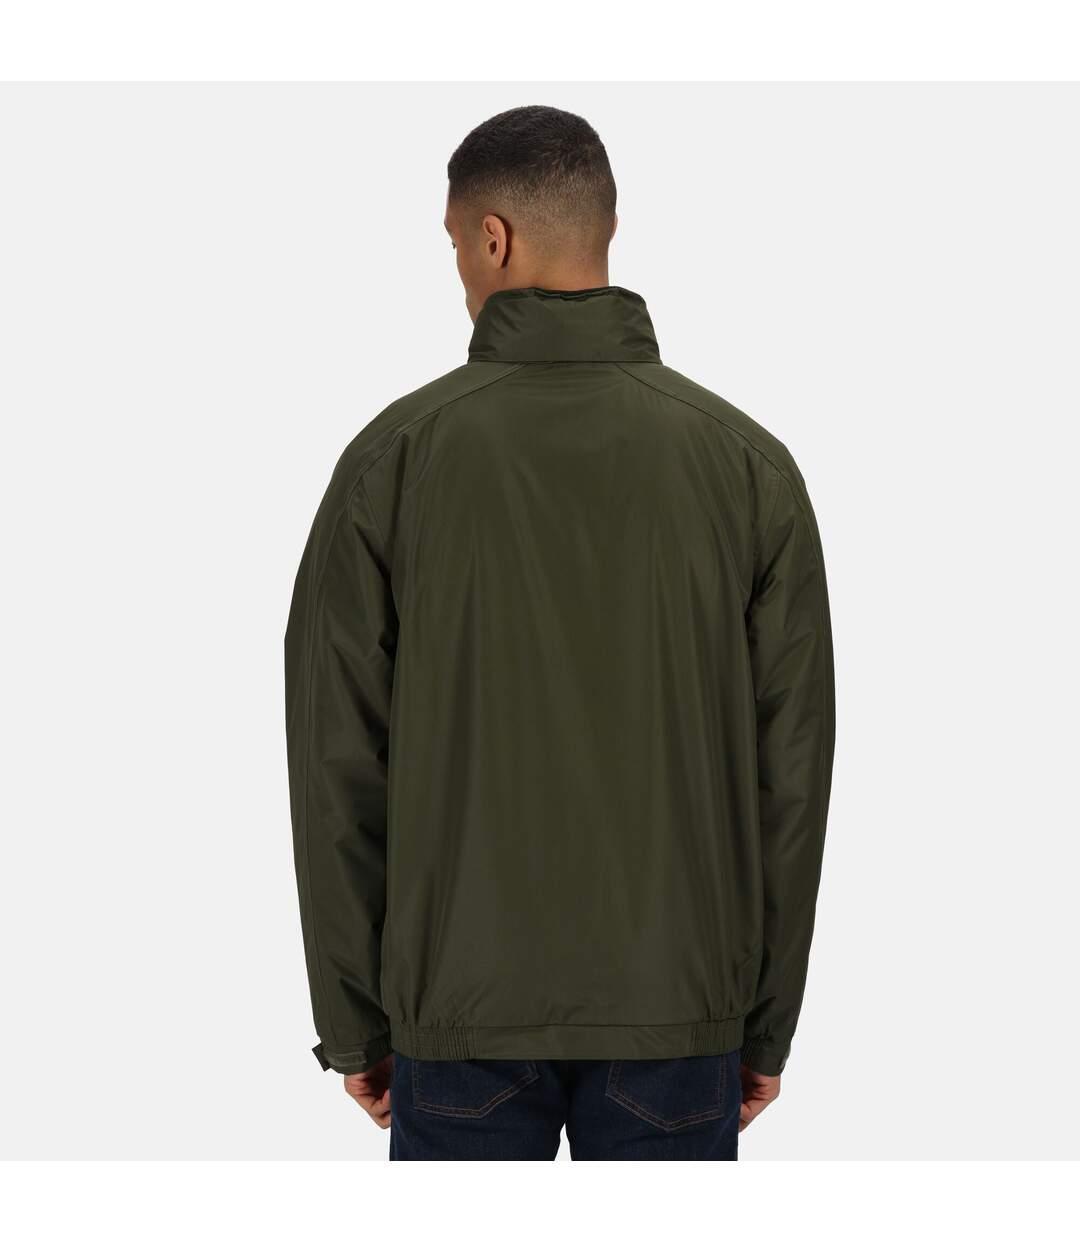 Regatta Dover Waterproof Windproof Jacket (Thermo-Guard Insulation) (Dark Khaki/Black) - UTRG1425